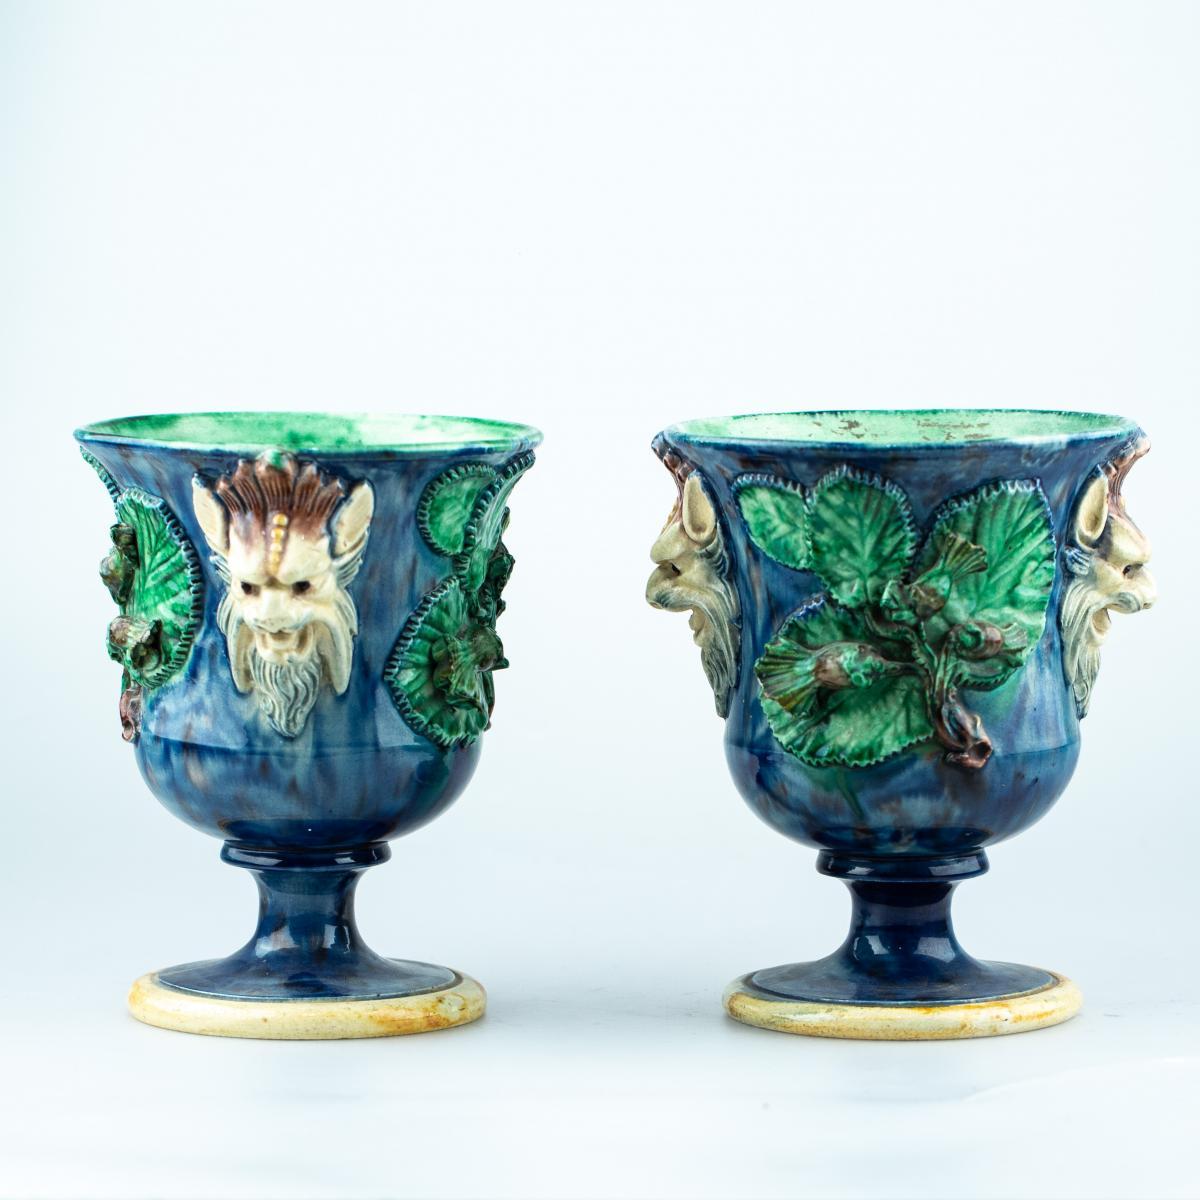 Pair Of Vase - Figulines Attr. To Thomas-victor Sergeant 19th Century